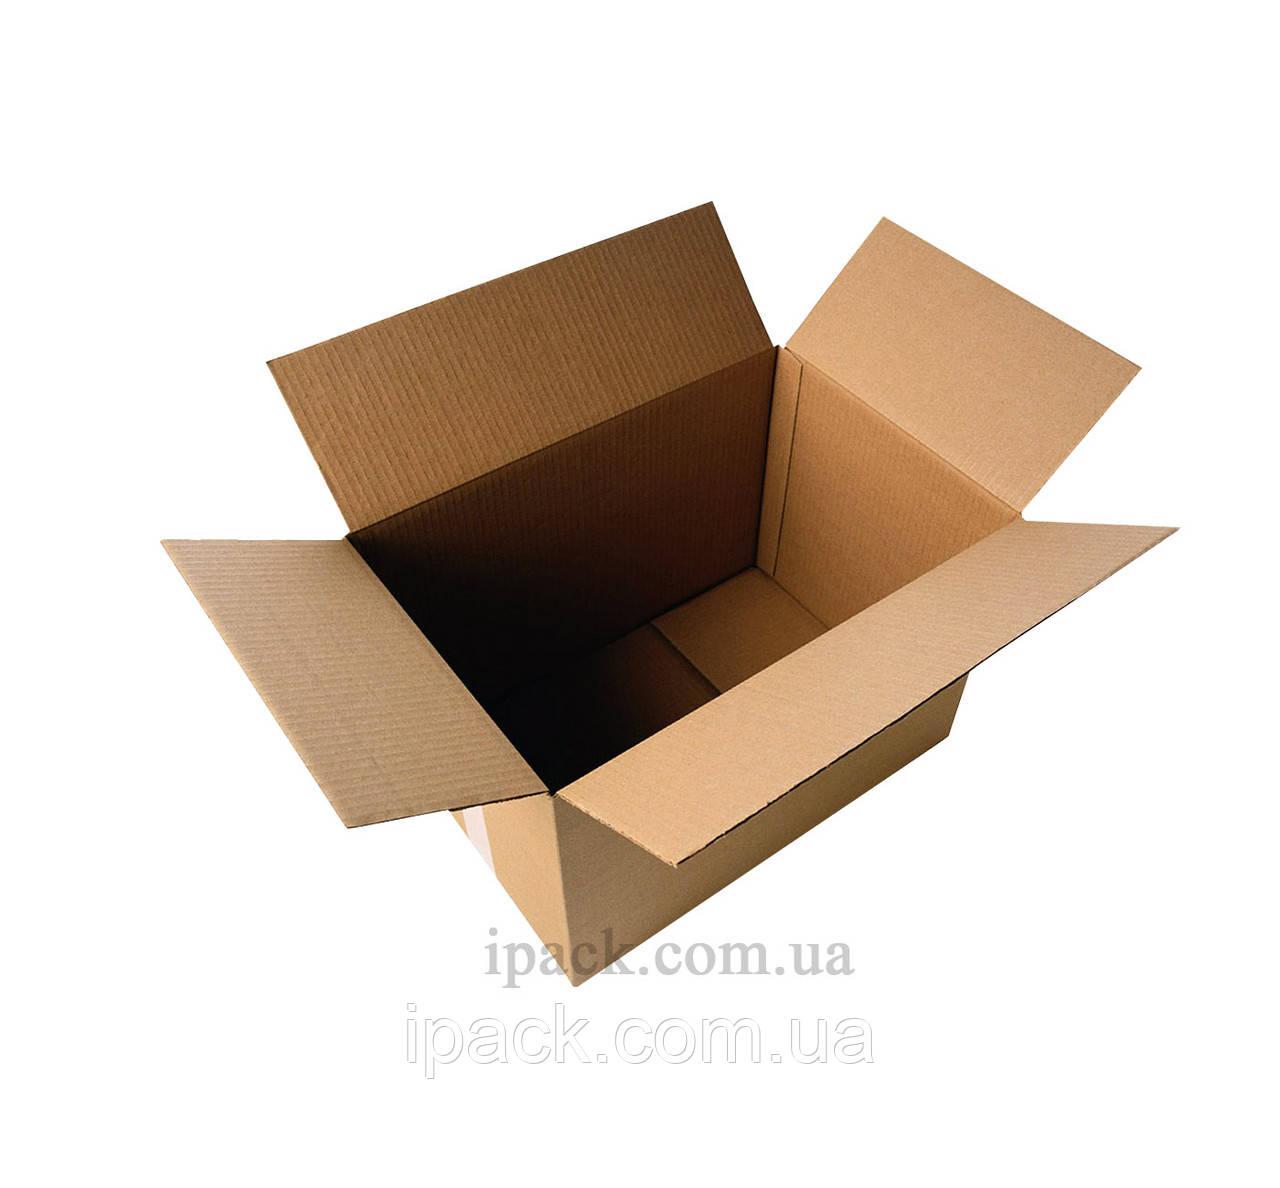 Гофроящик 455*385*970 мм, бурый, четырехклапанный картонный короб